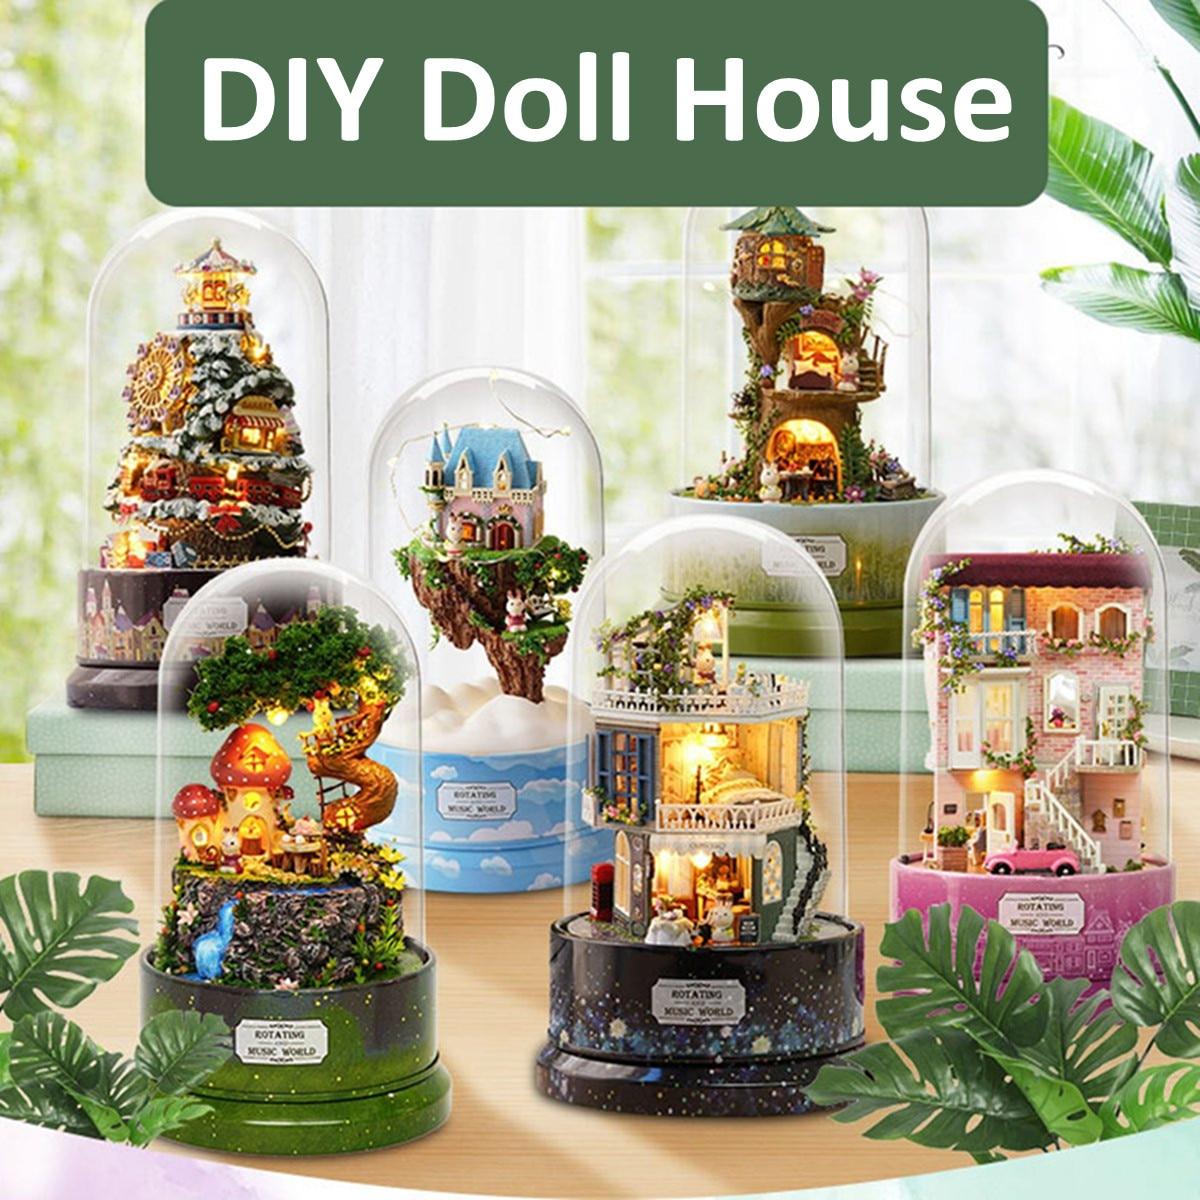 Rotating Music Box DIY Dolls House Luminous Dollhouse Musical Case Cloche Handmade Miniature Kits Christmas Gifts Kids Toy